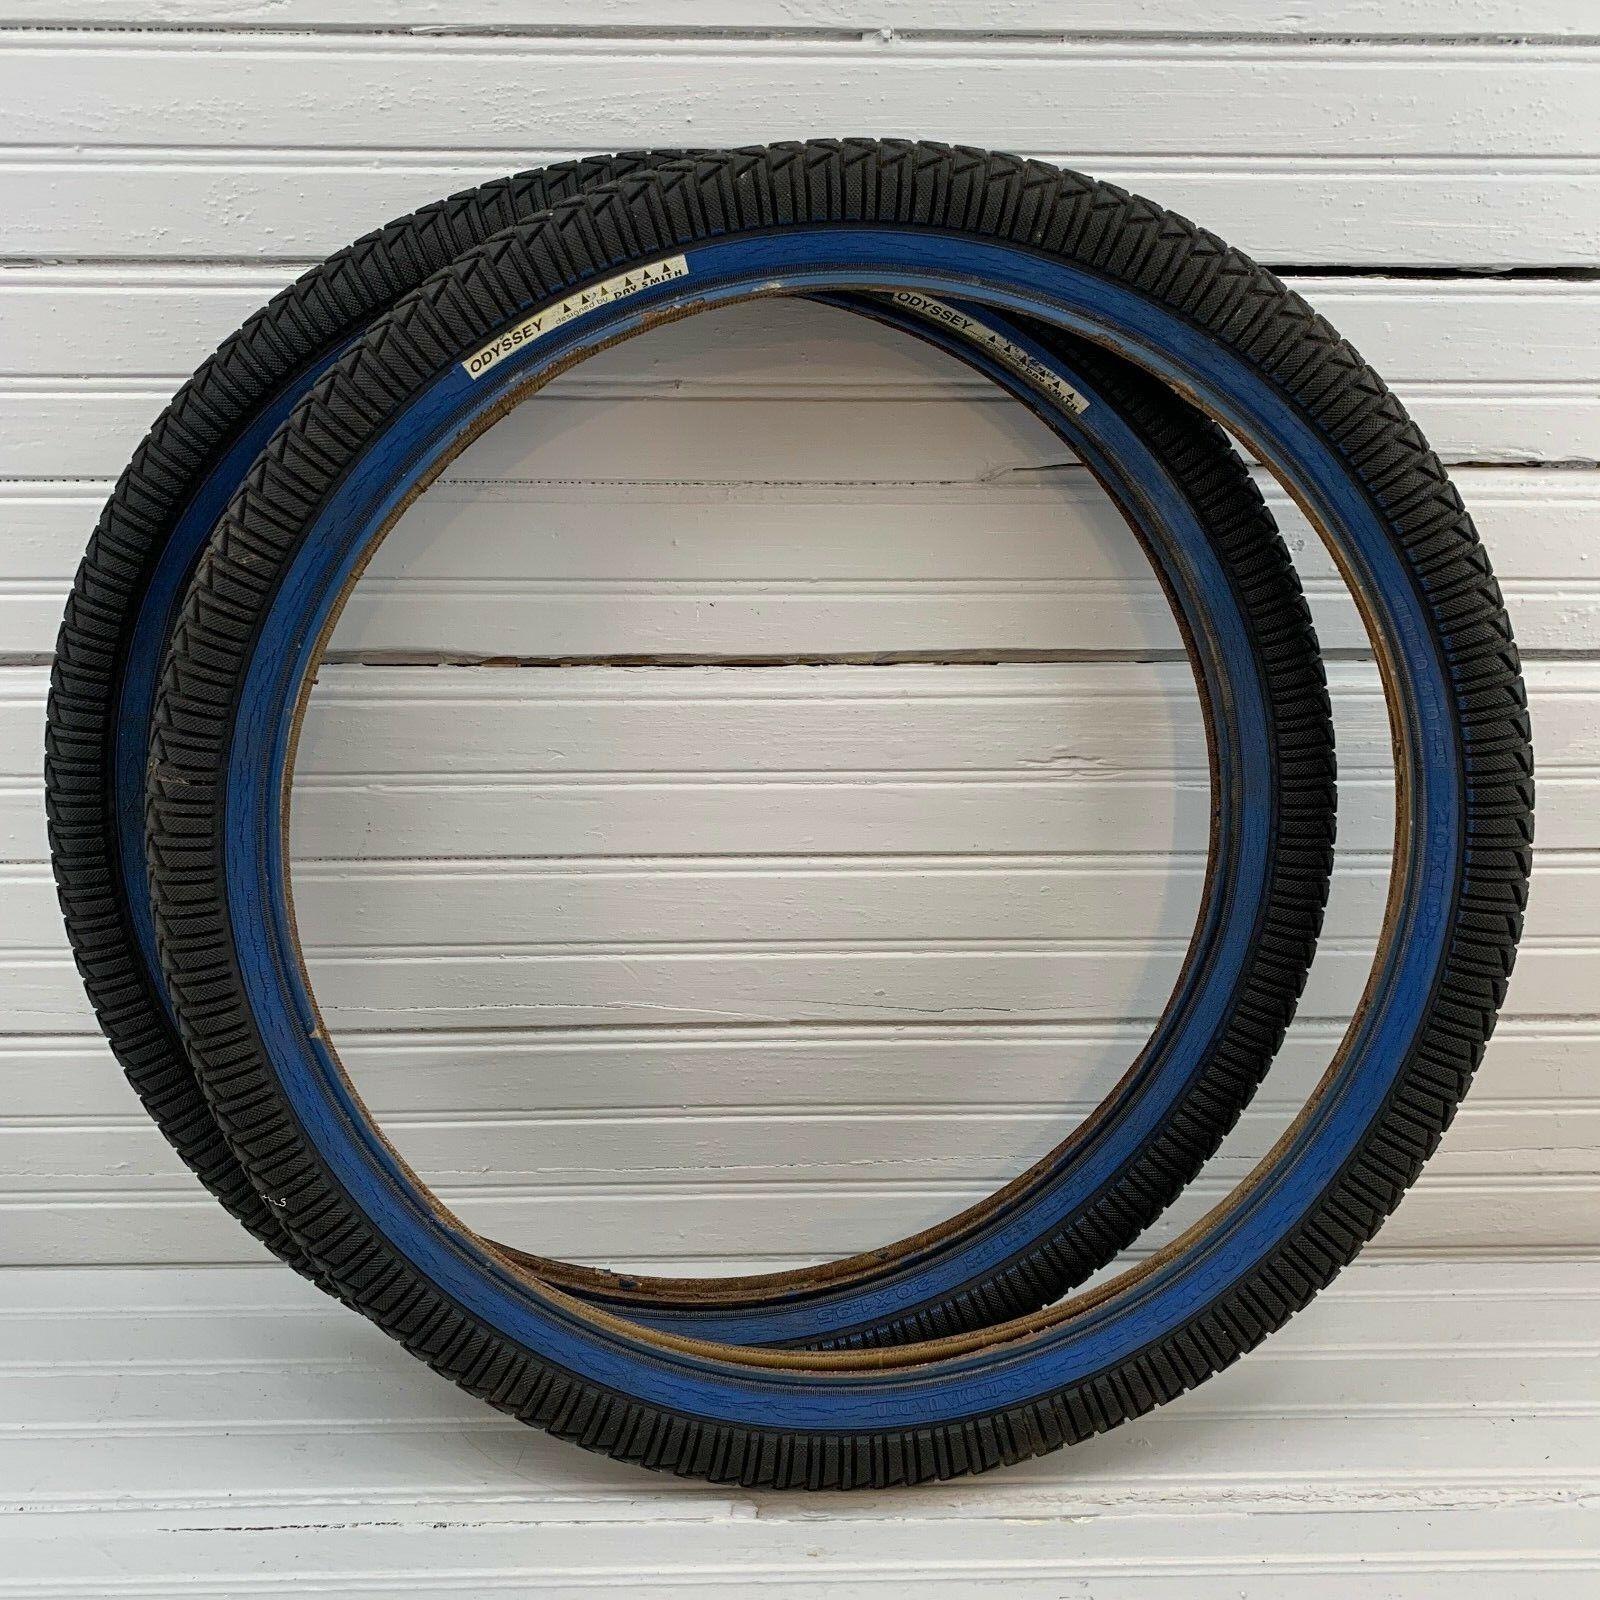 1999 Odyssey Bermuda Day Smith 20x1.95 Tires  bluee Stripe Mid School BMX Hoffman